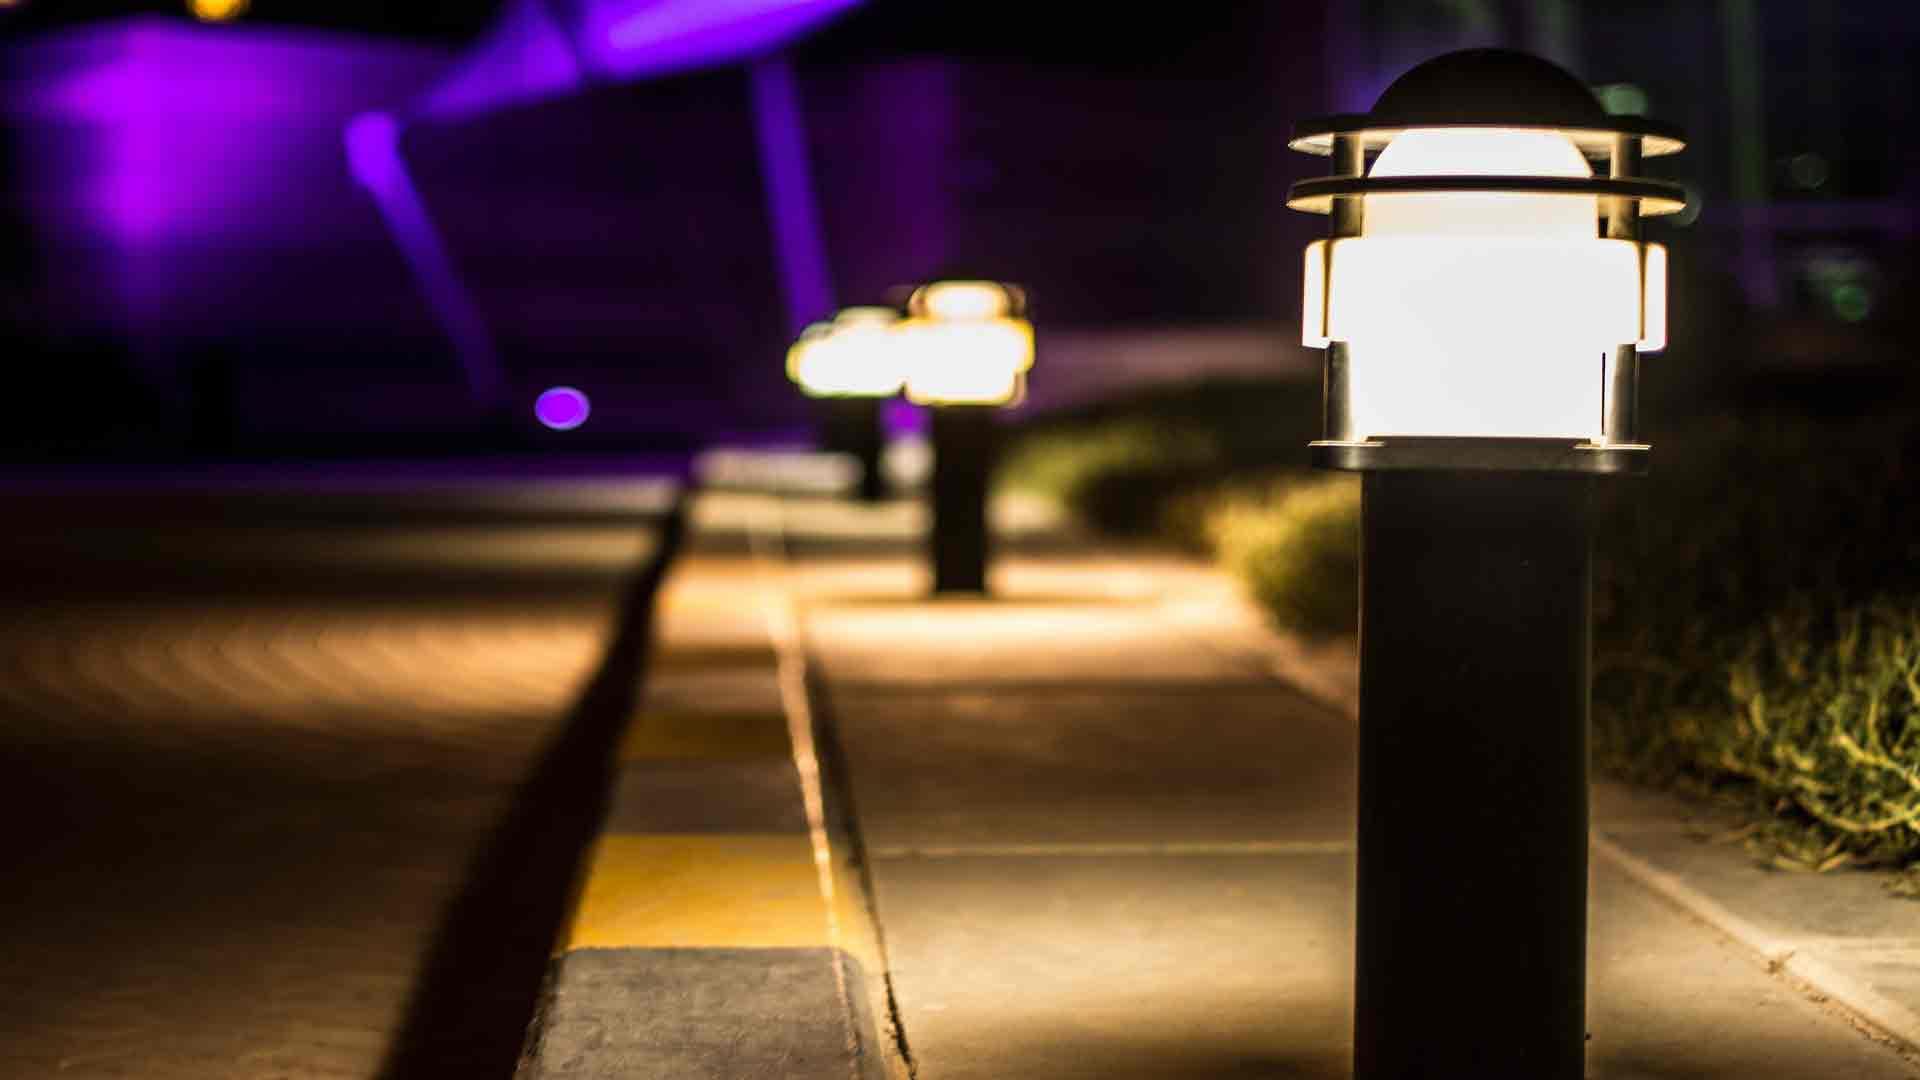 4 elementos bsicos para la iluminacin exterior  Onemons